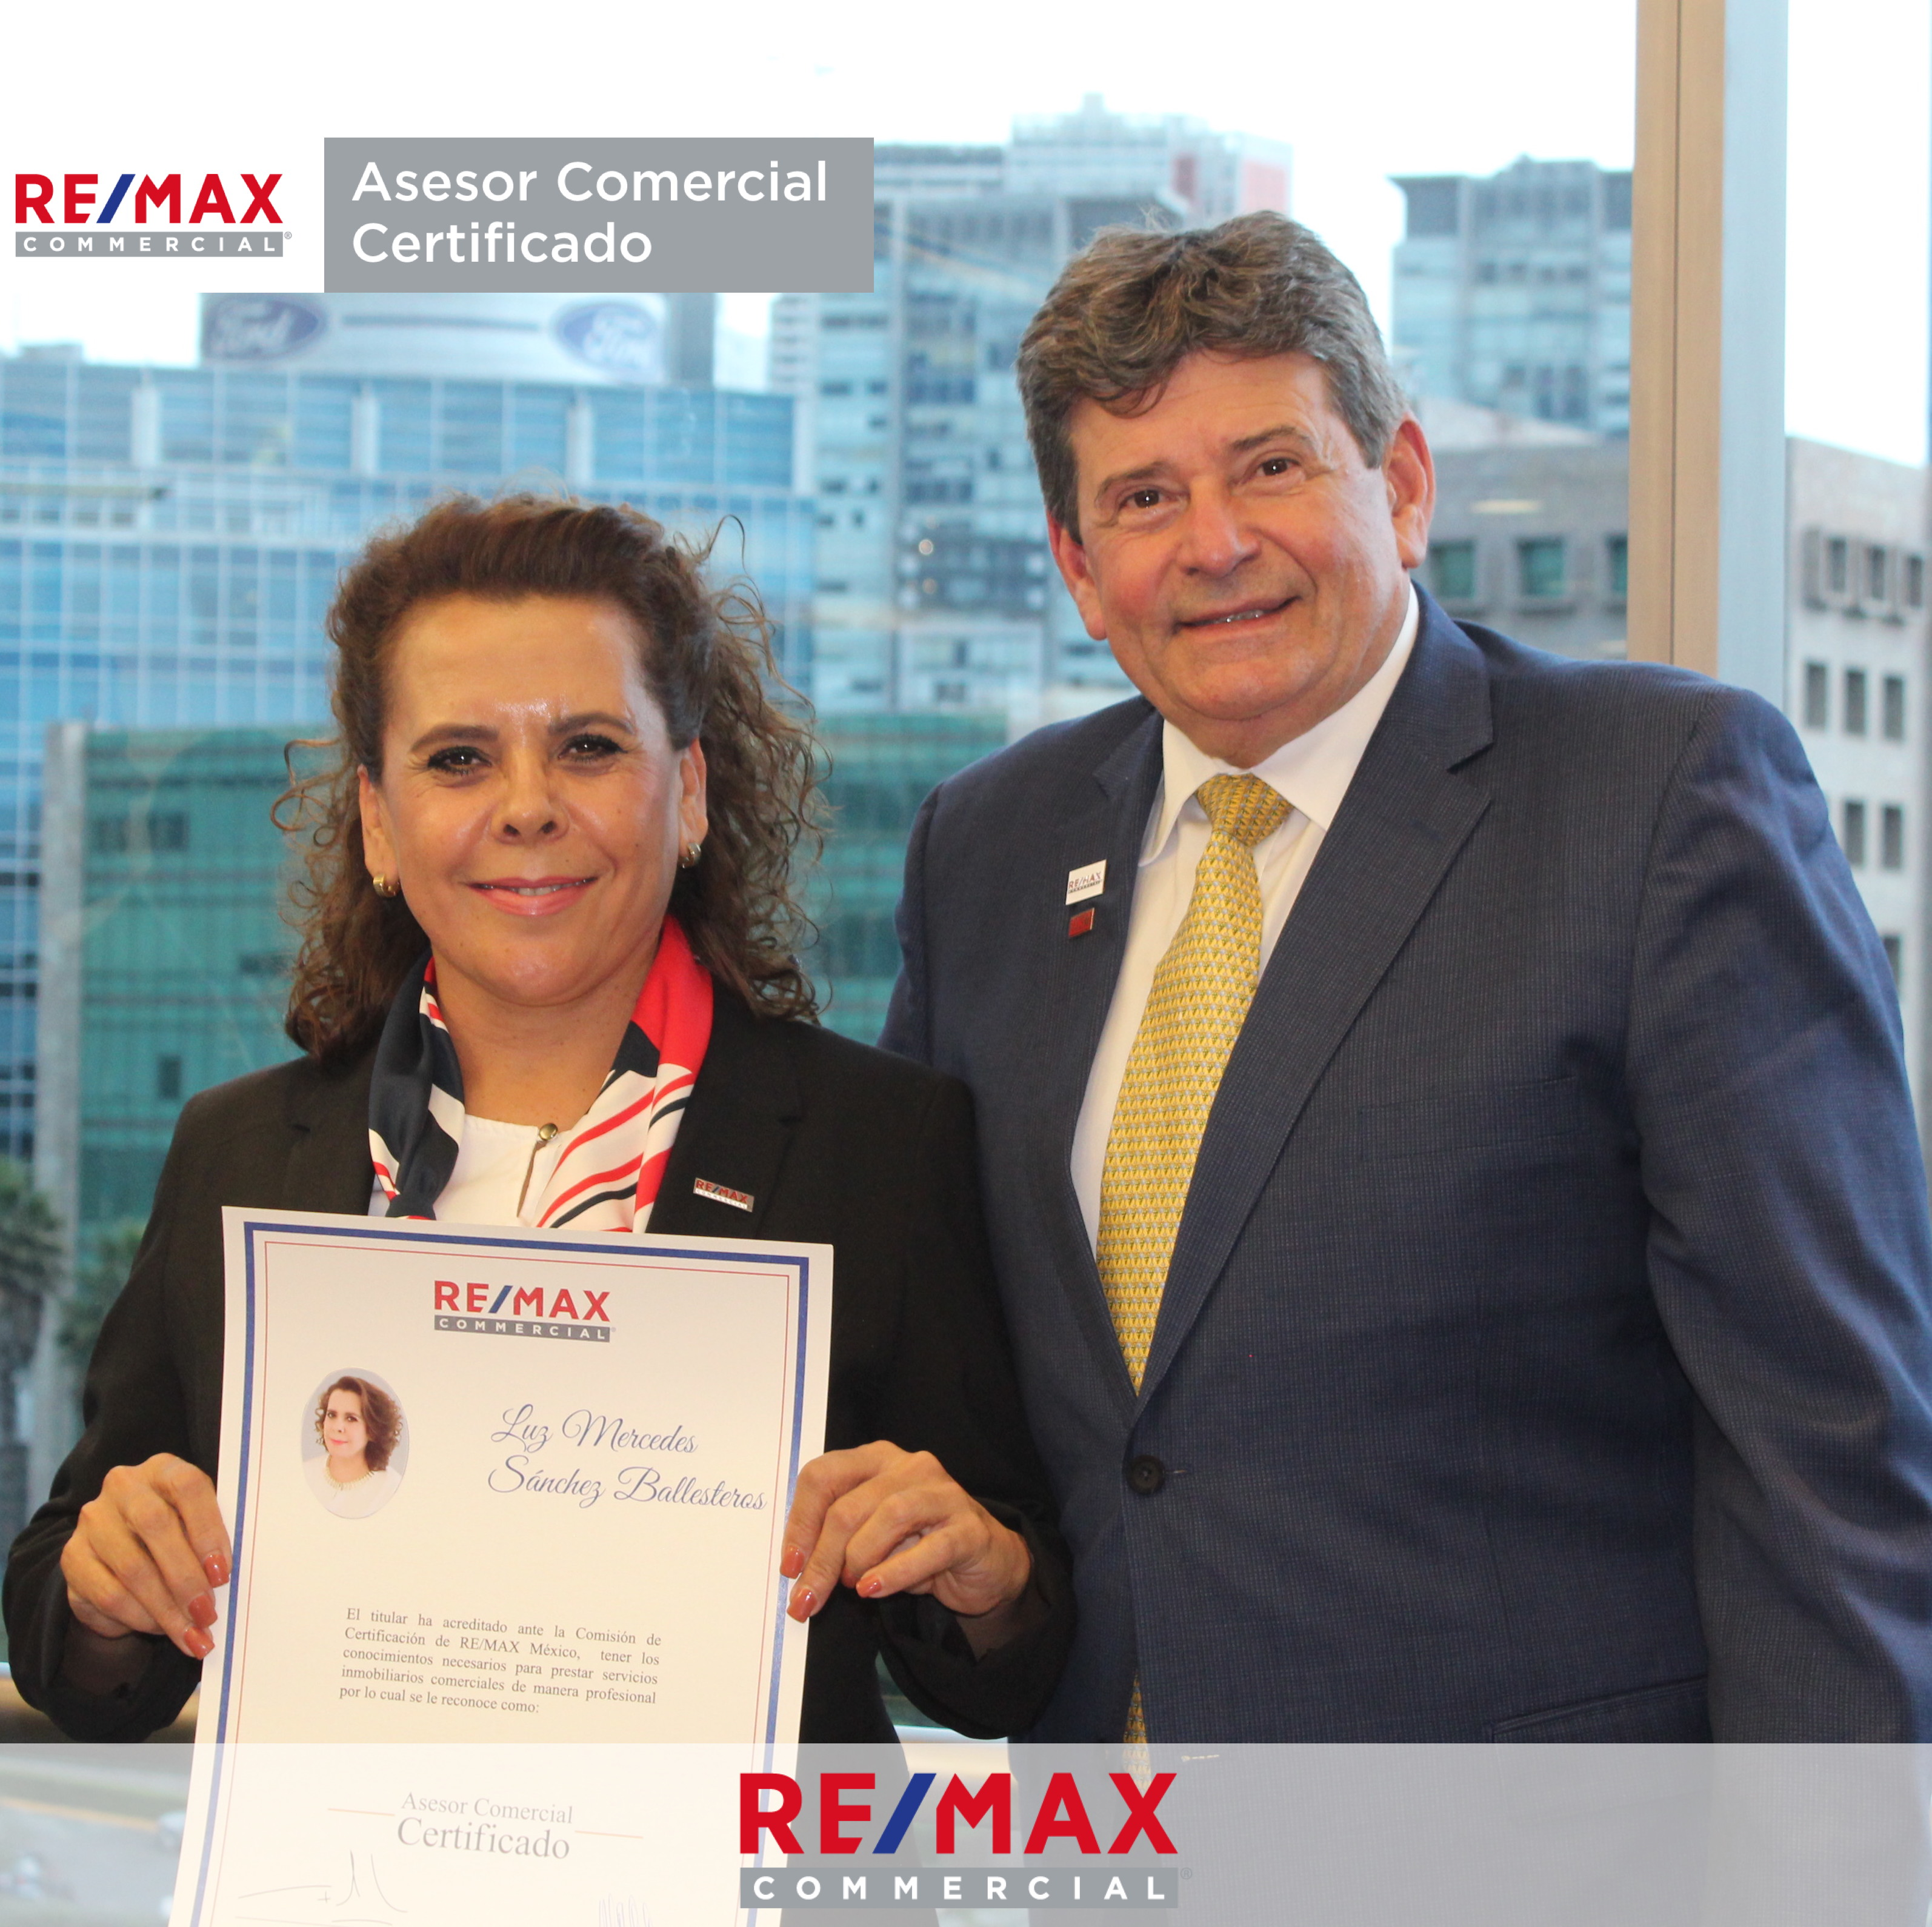 11_Certificacion_comercial_comprar_rentar_vender_casa_departamento_franquicias_inmobiliarias_REMAX_mexico_propiedades_comerciales_terrenos_bodegas